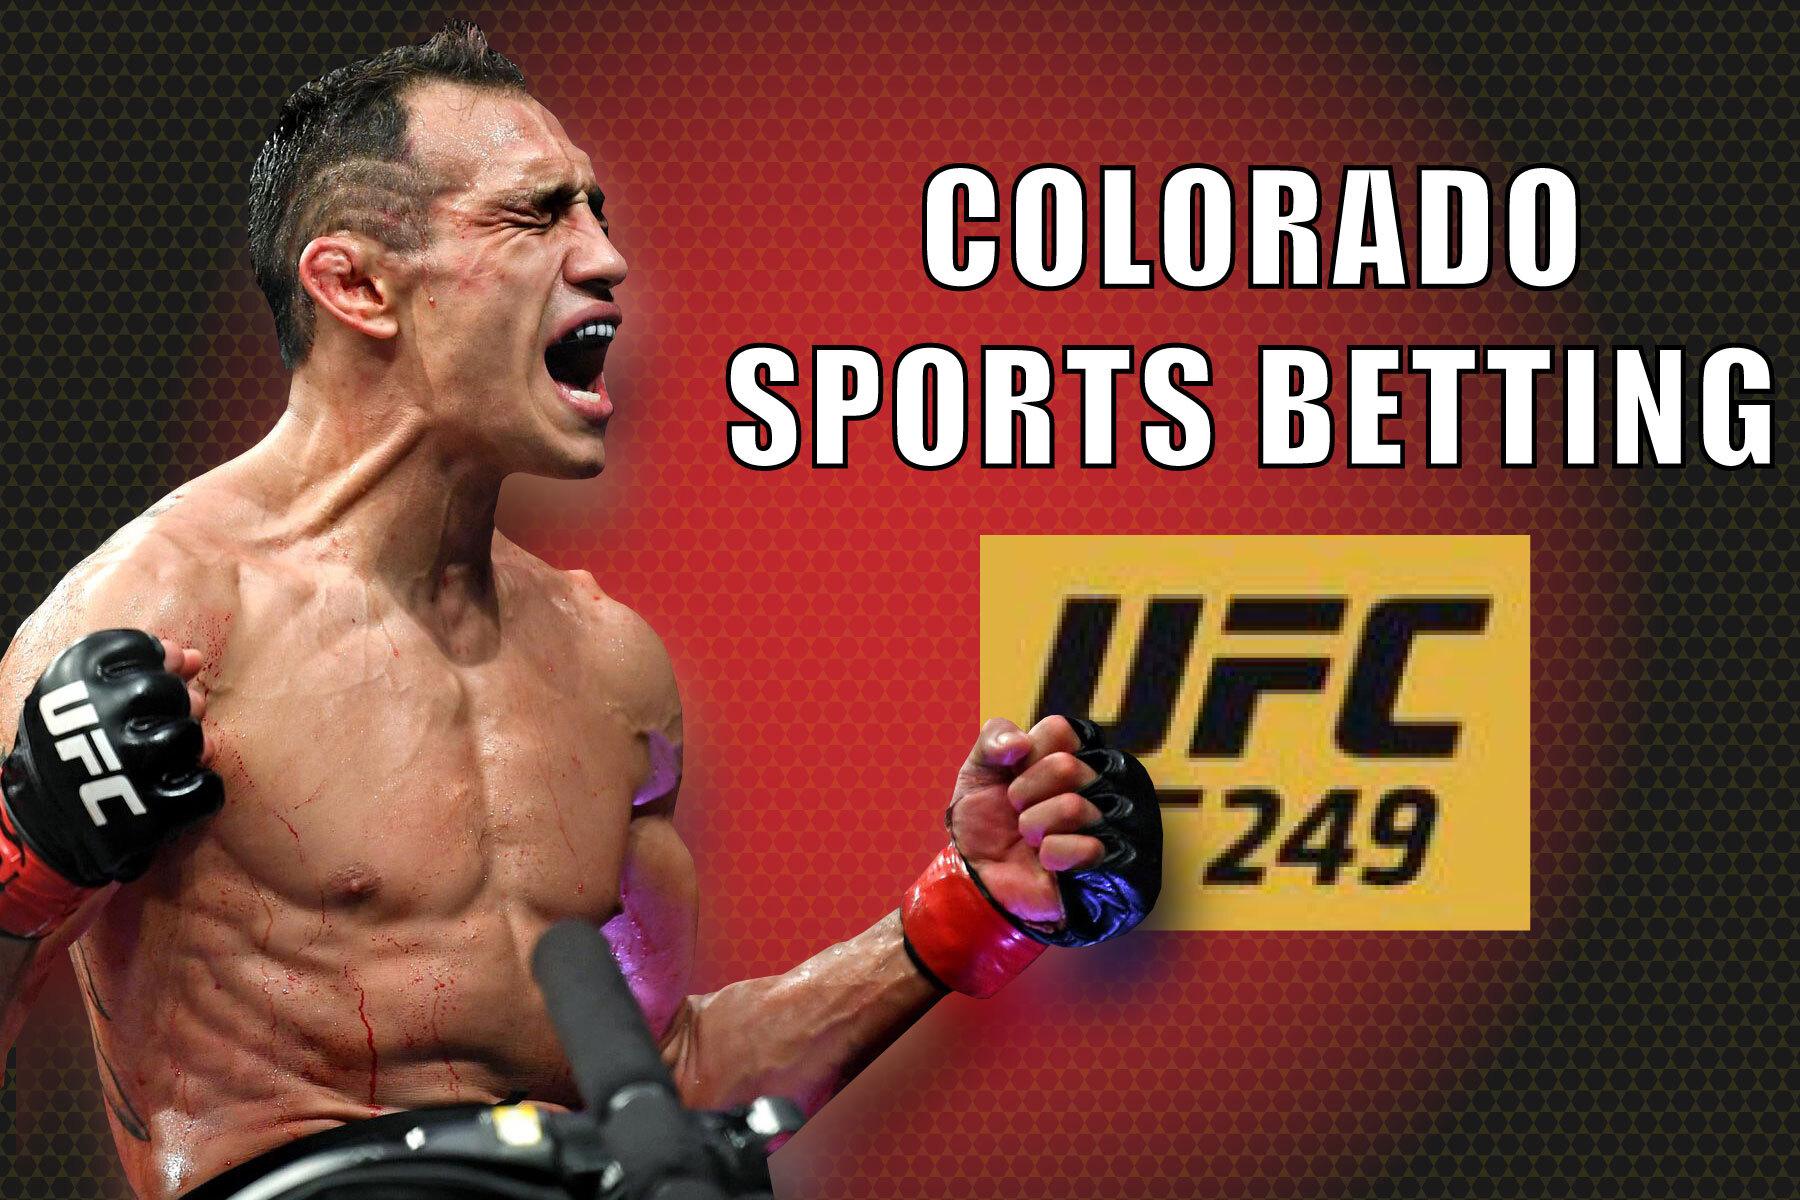 colorado online sports betting ufc 249